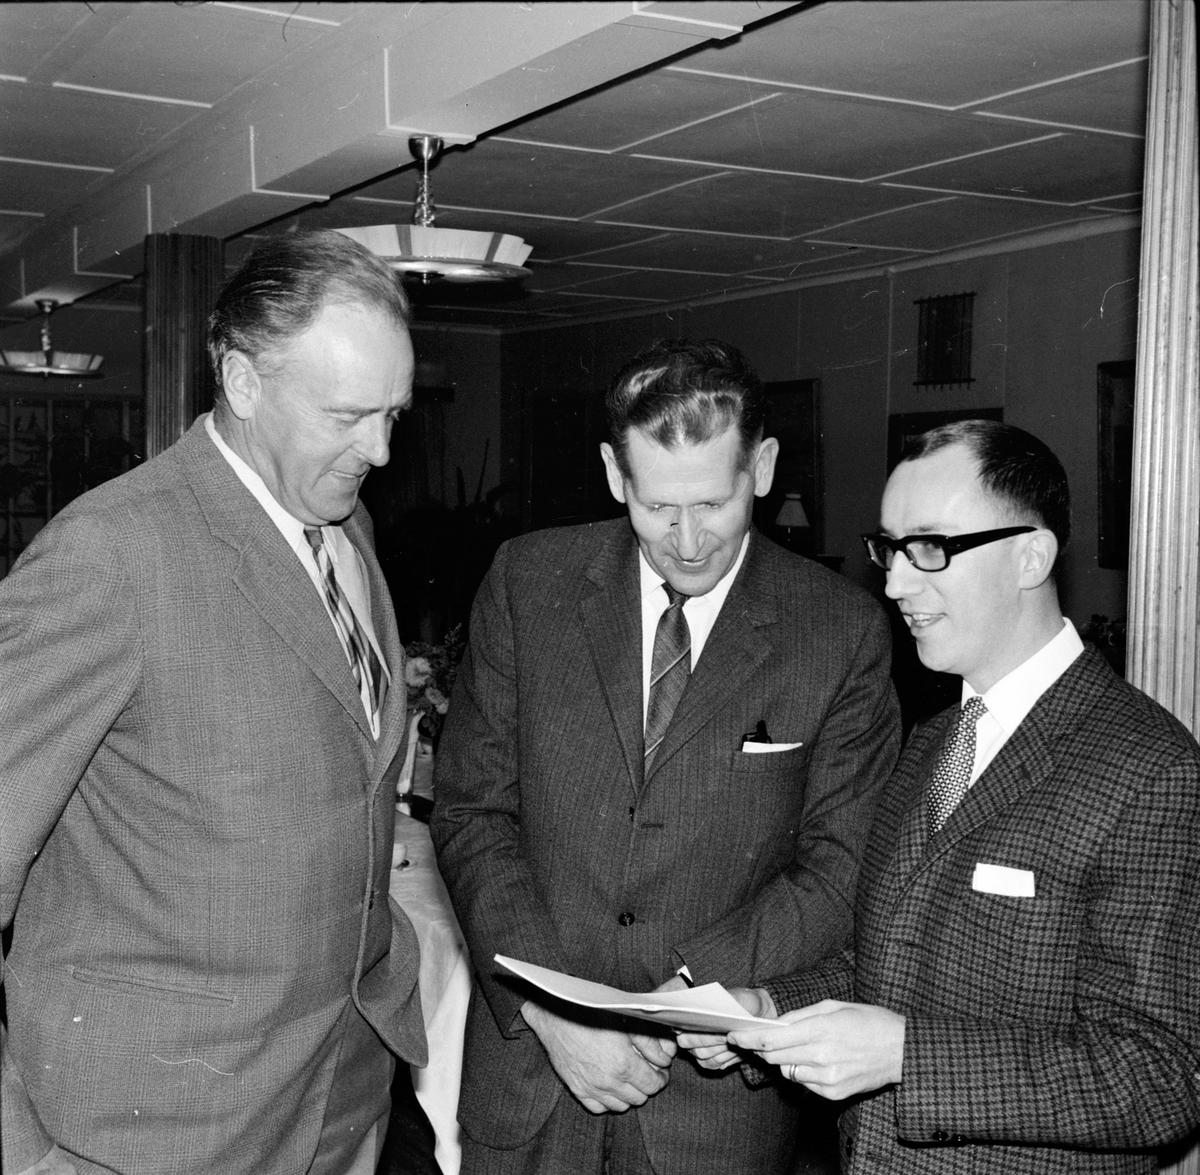 Arbrå, Skifte på komm.ordf.posten, Emil Jonsson går, Eric L Ericsson kommer, 18 December 1967